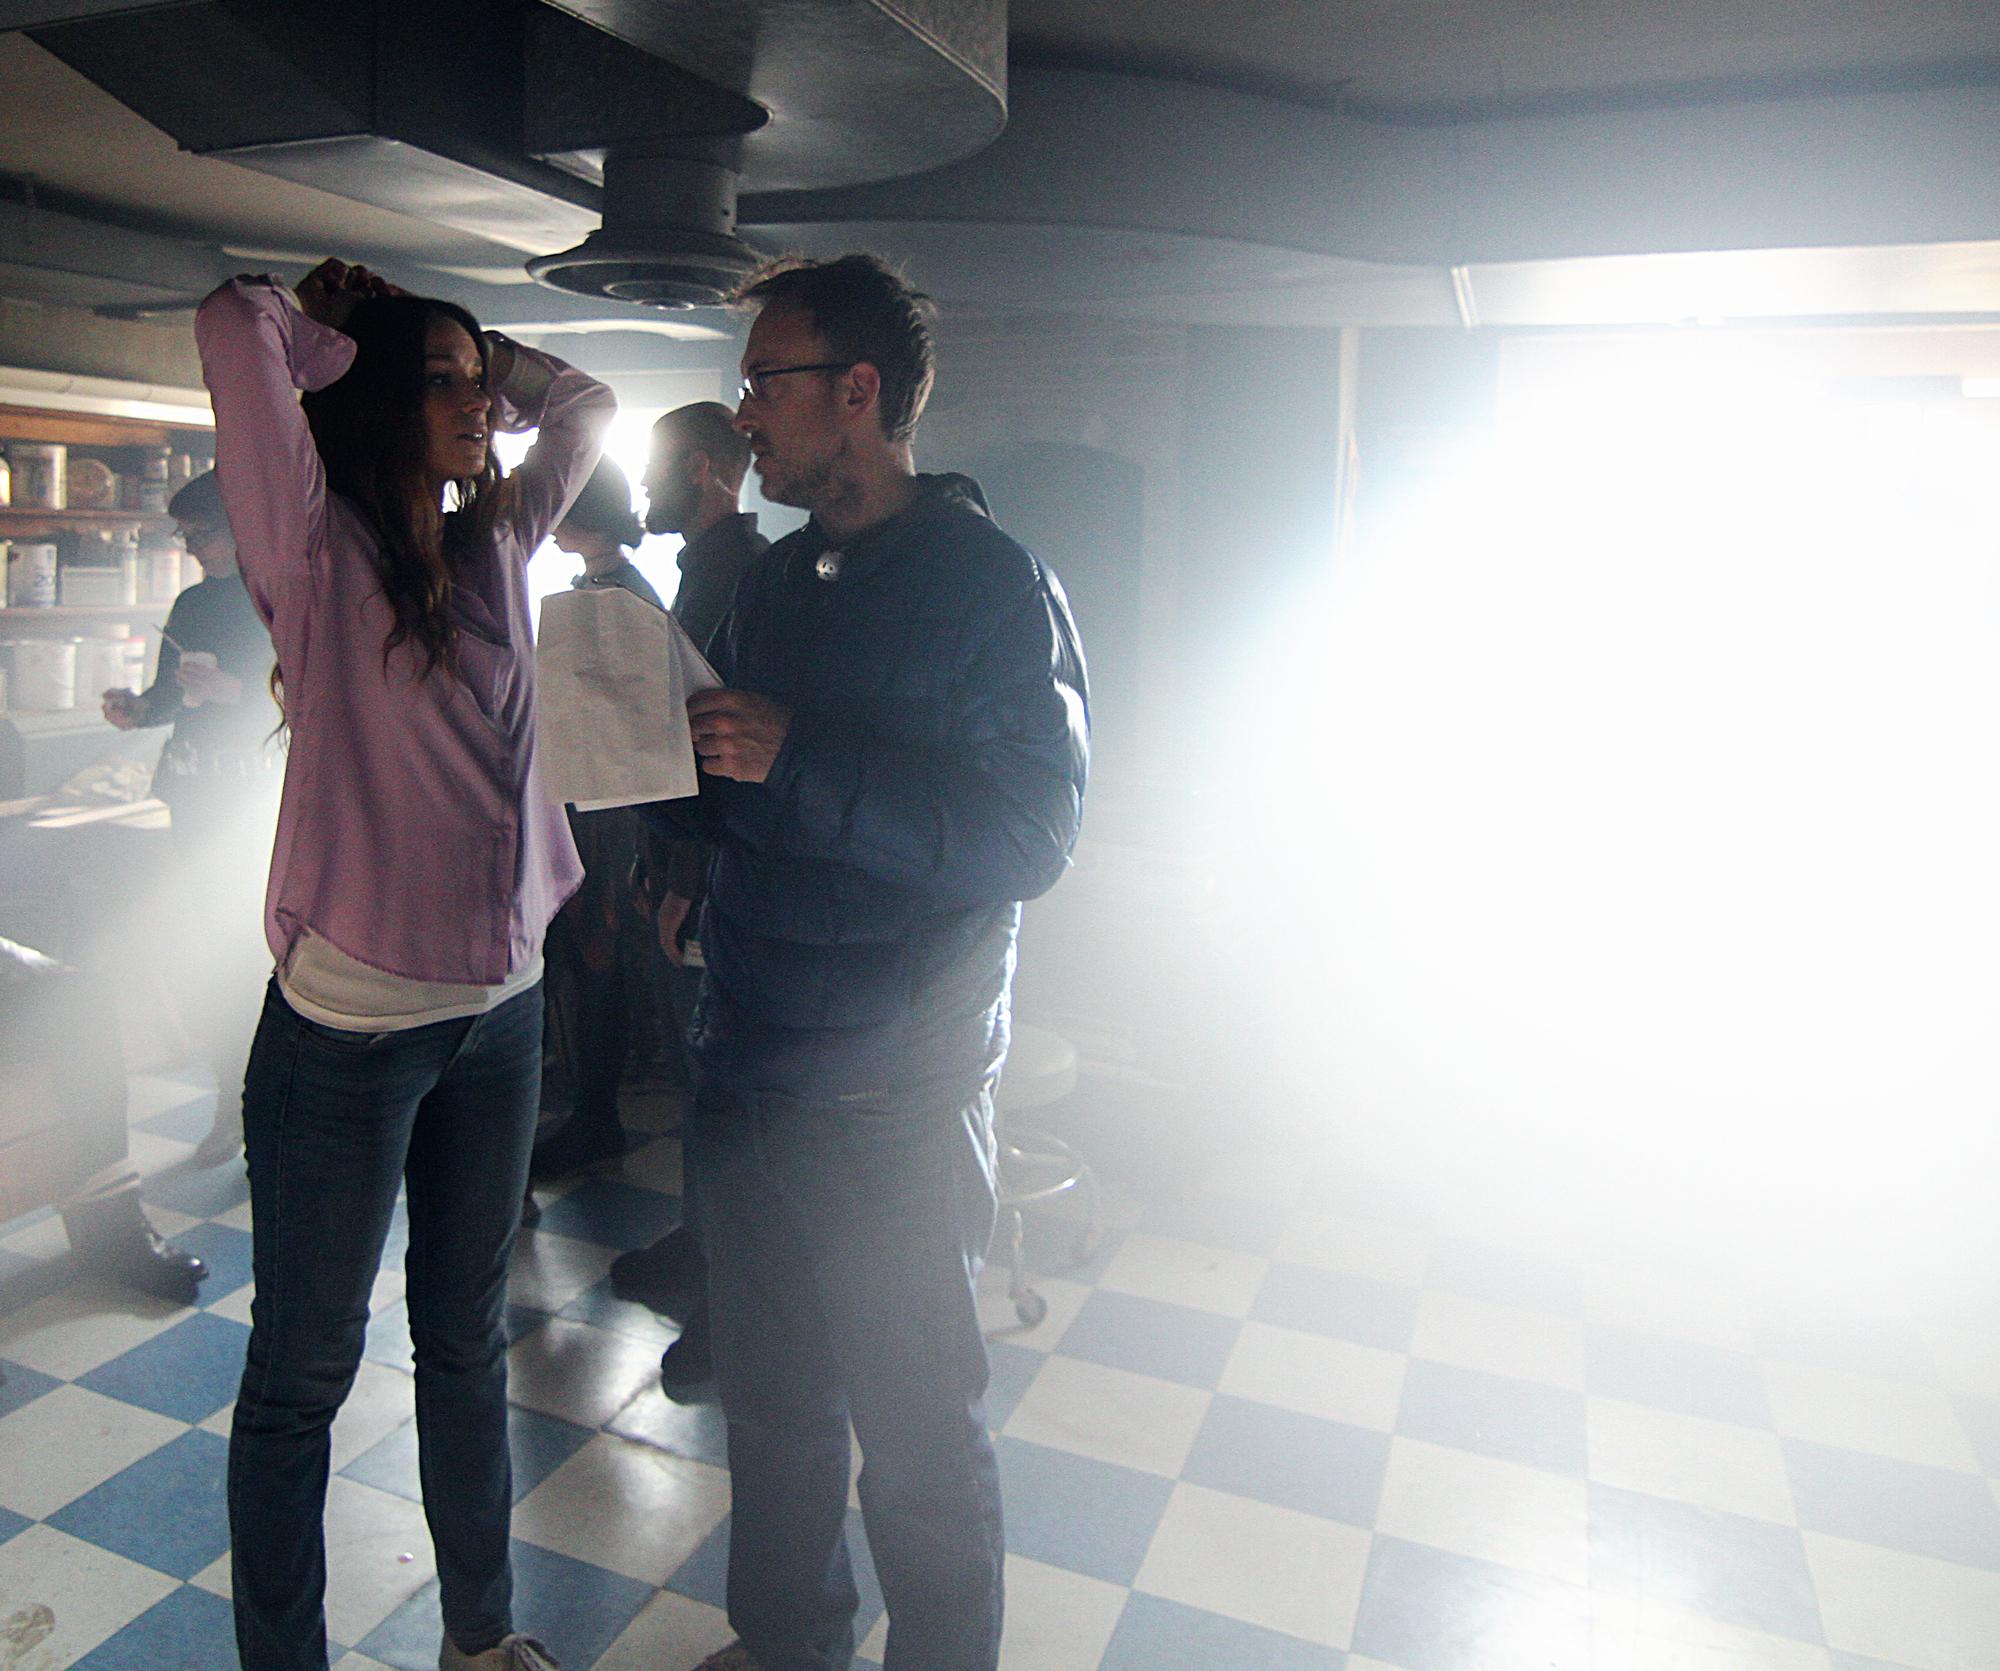 Julius Ramsay and Alex Essoe before a critical scene of home-invasion horror.